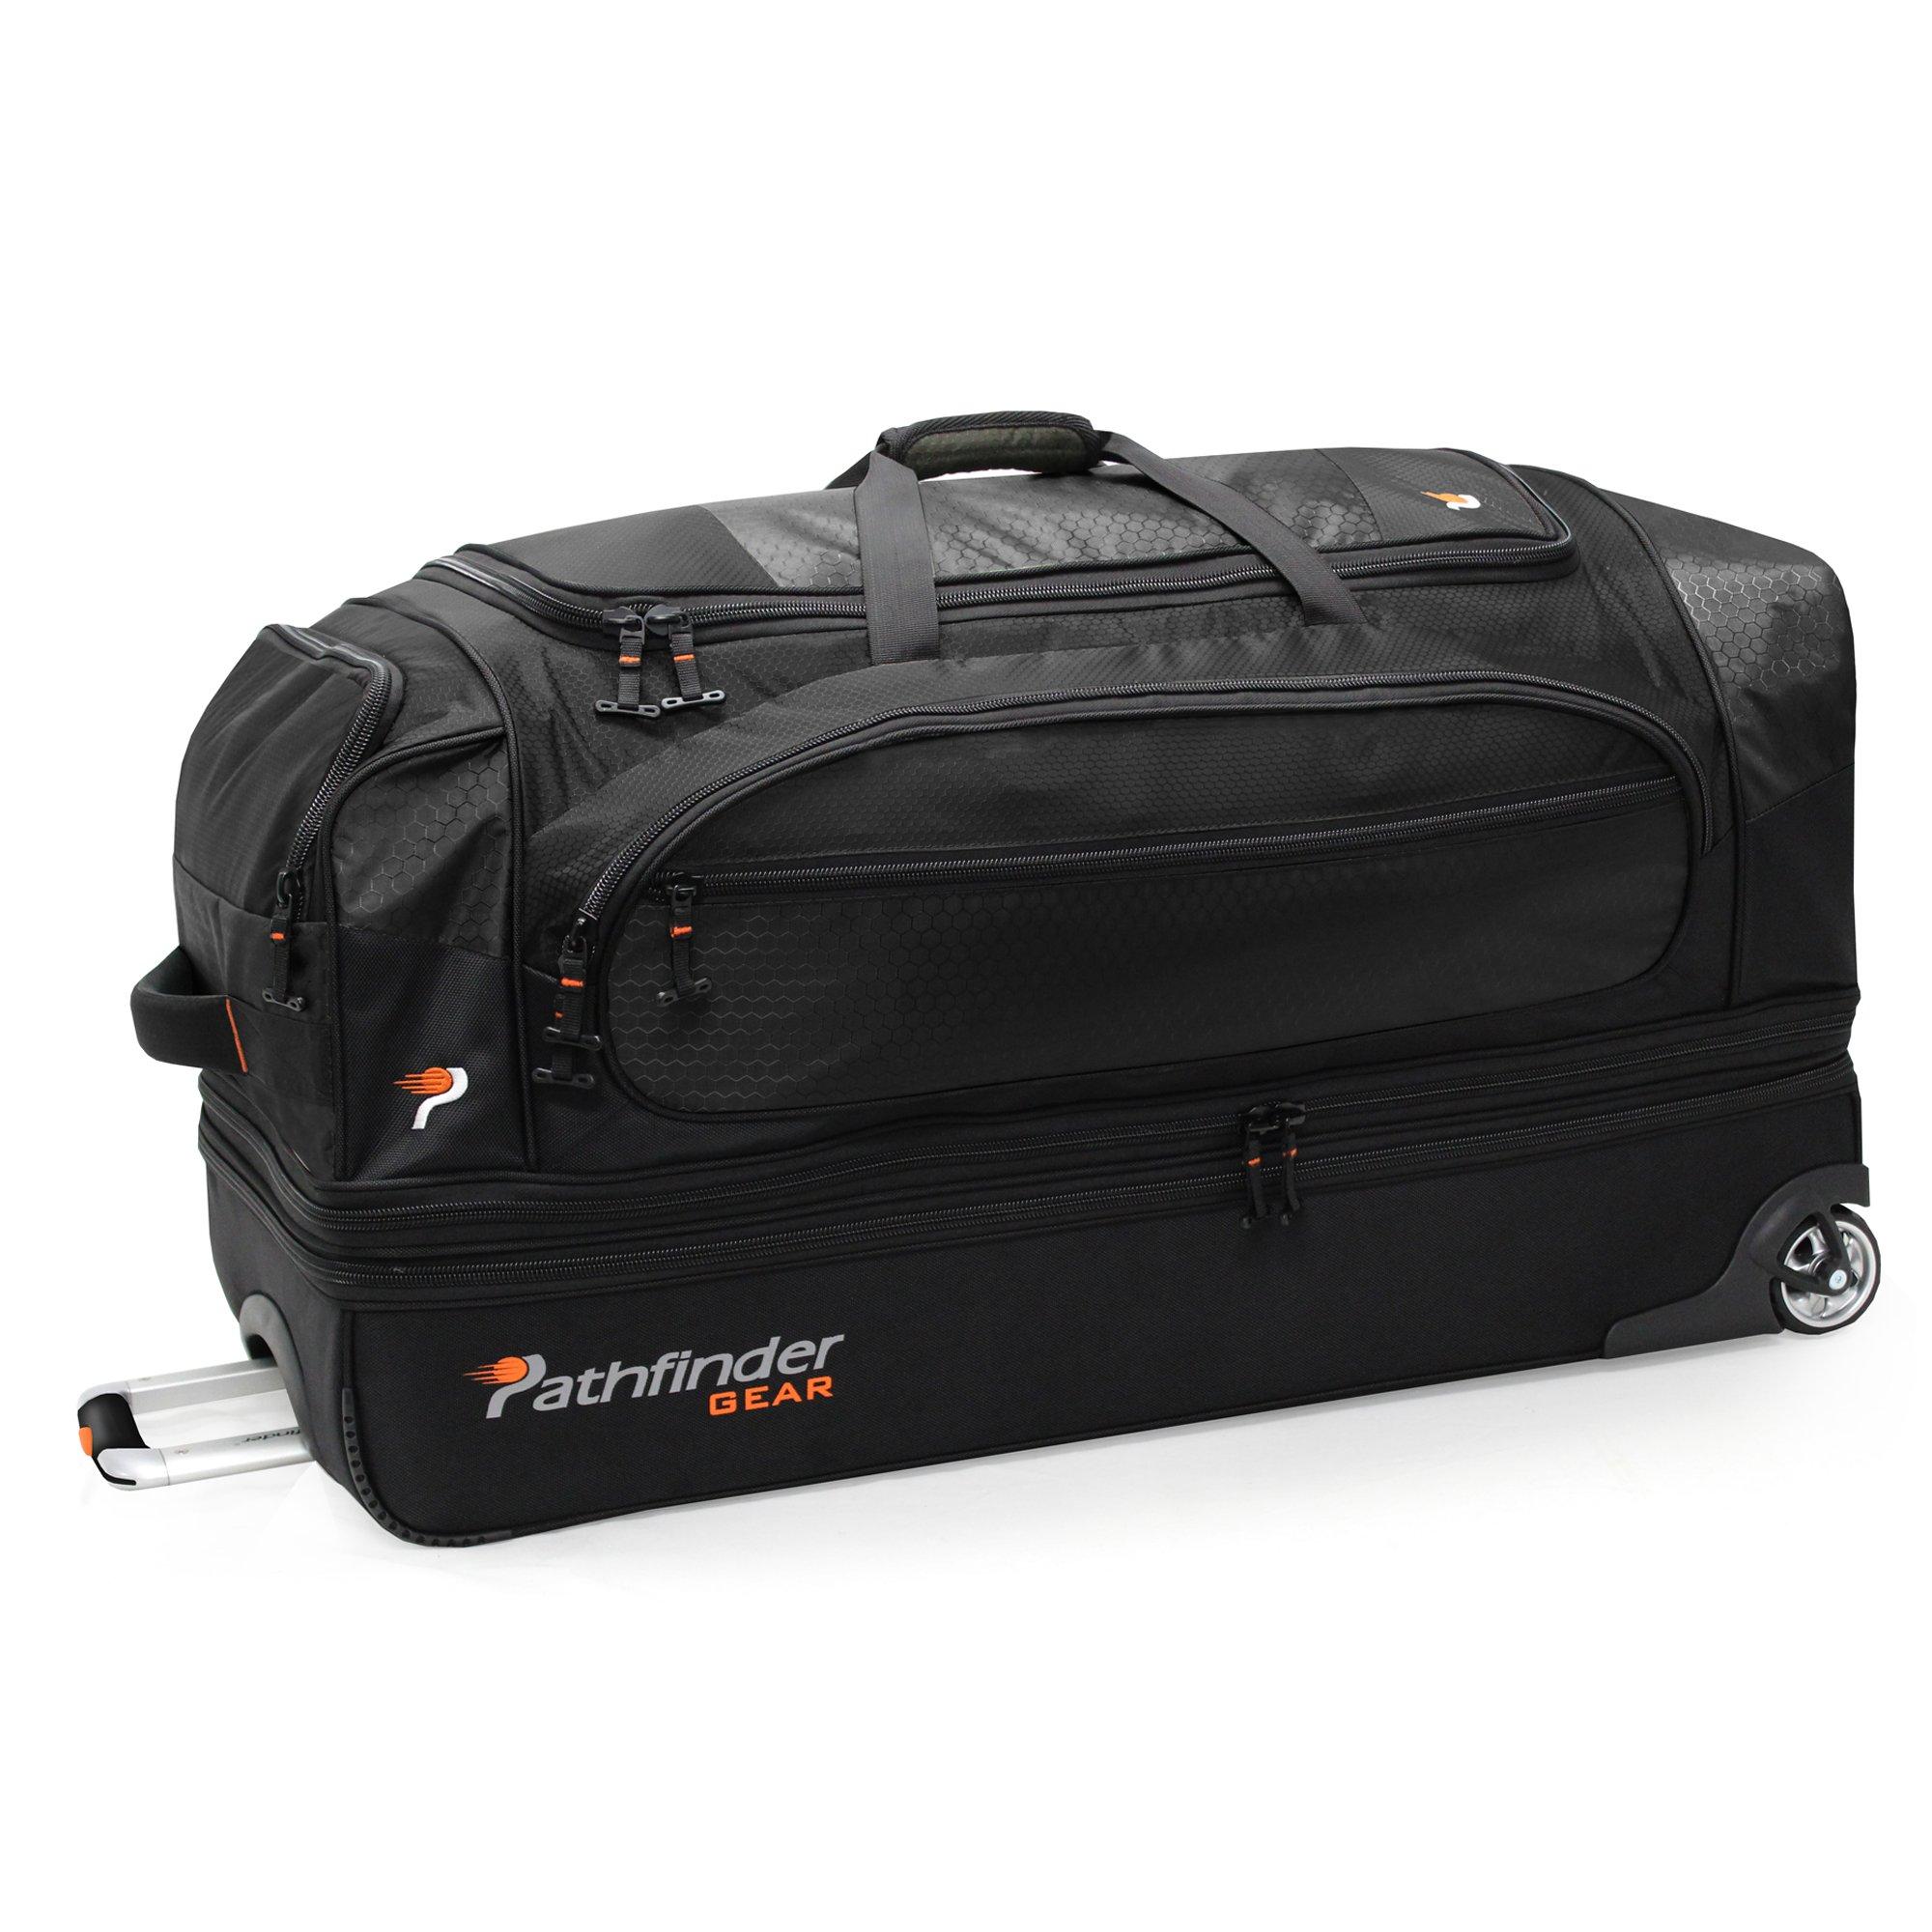 Pathfinder Gear 36 Inch Rolling Drop Bottom Duffel, Black, One Size by Pathfinder